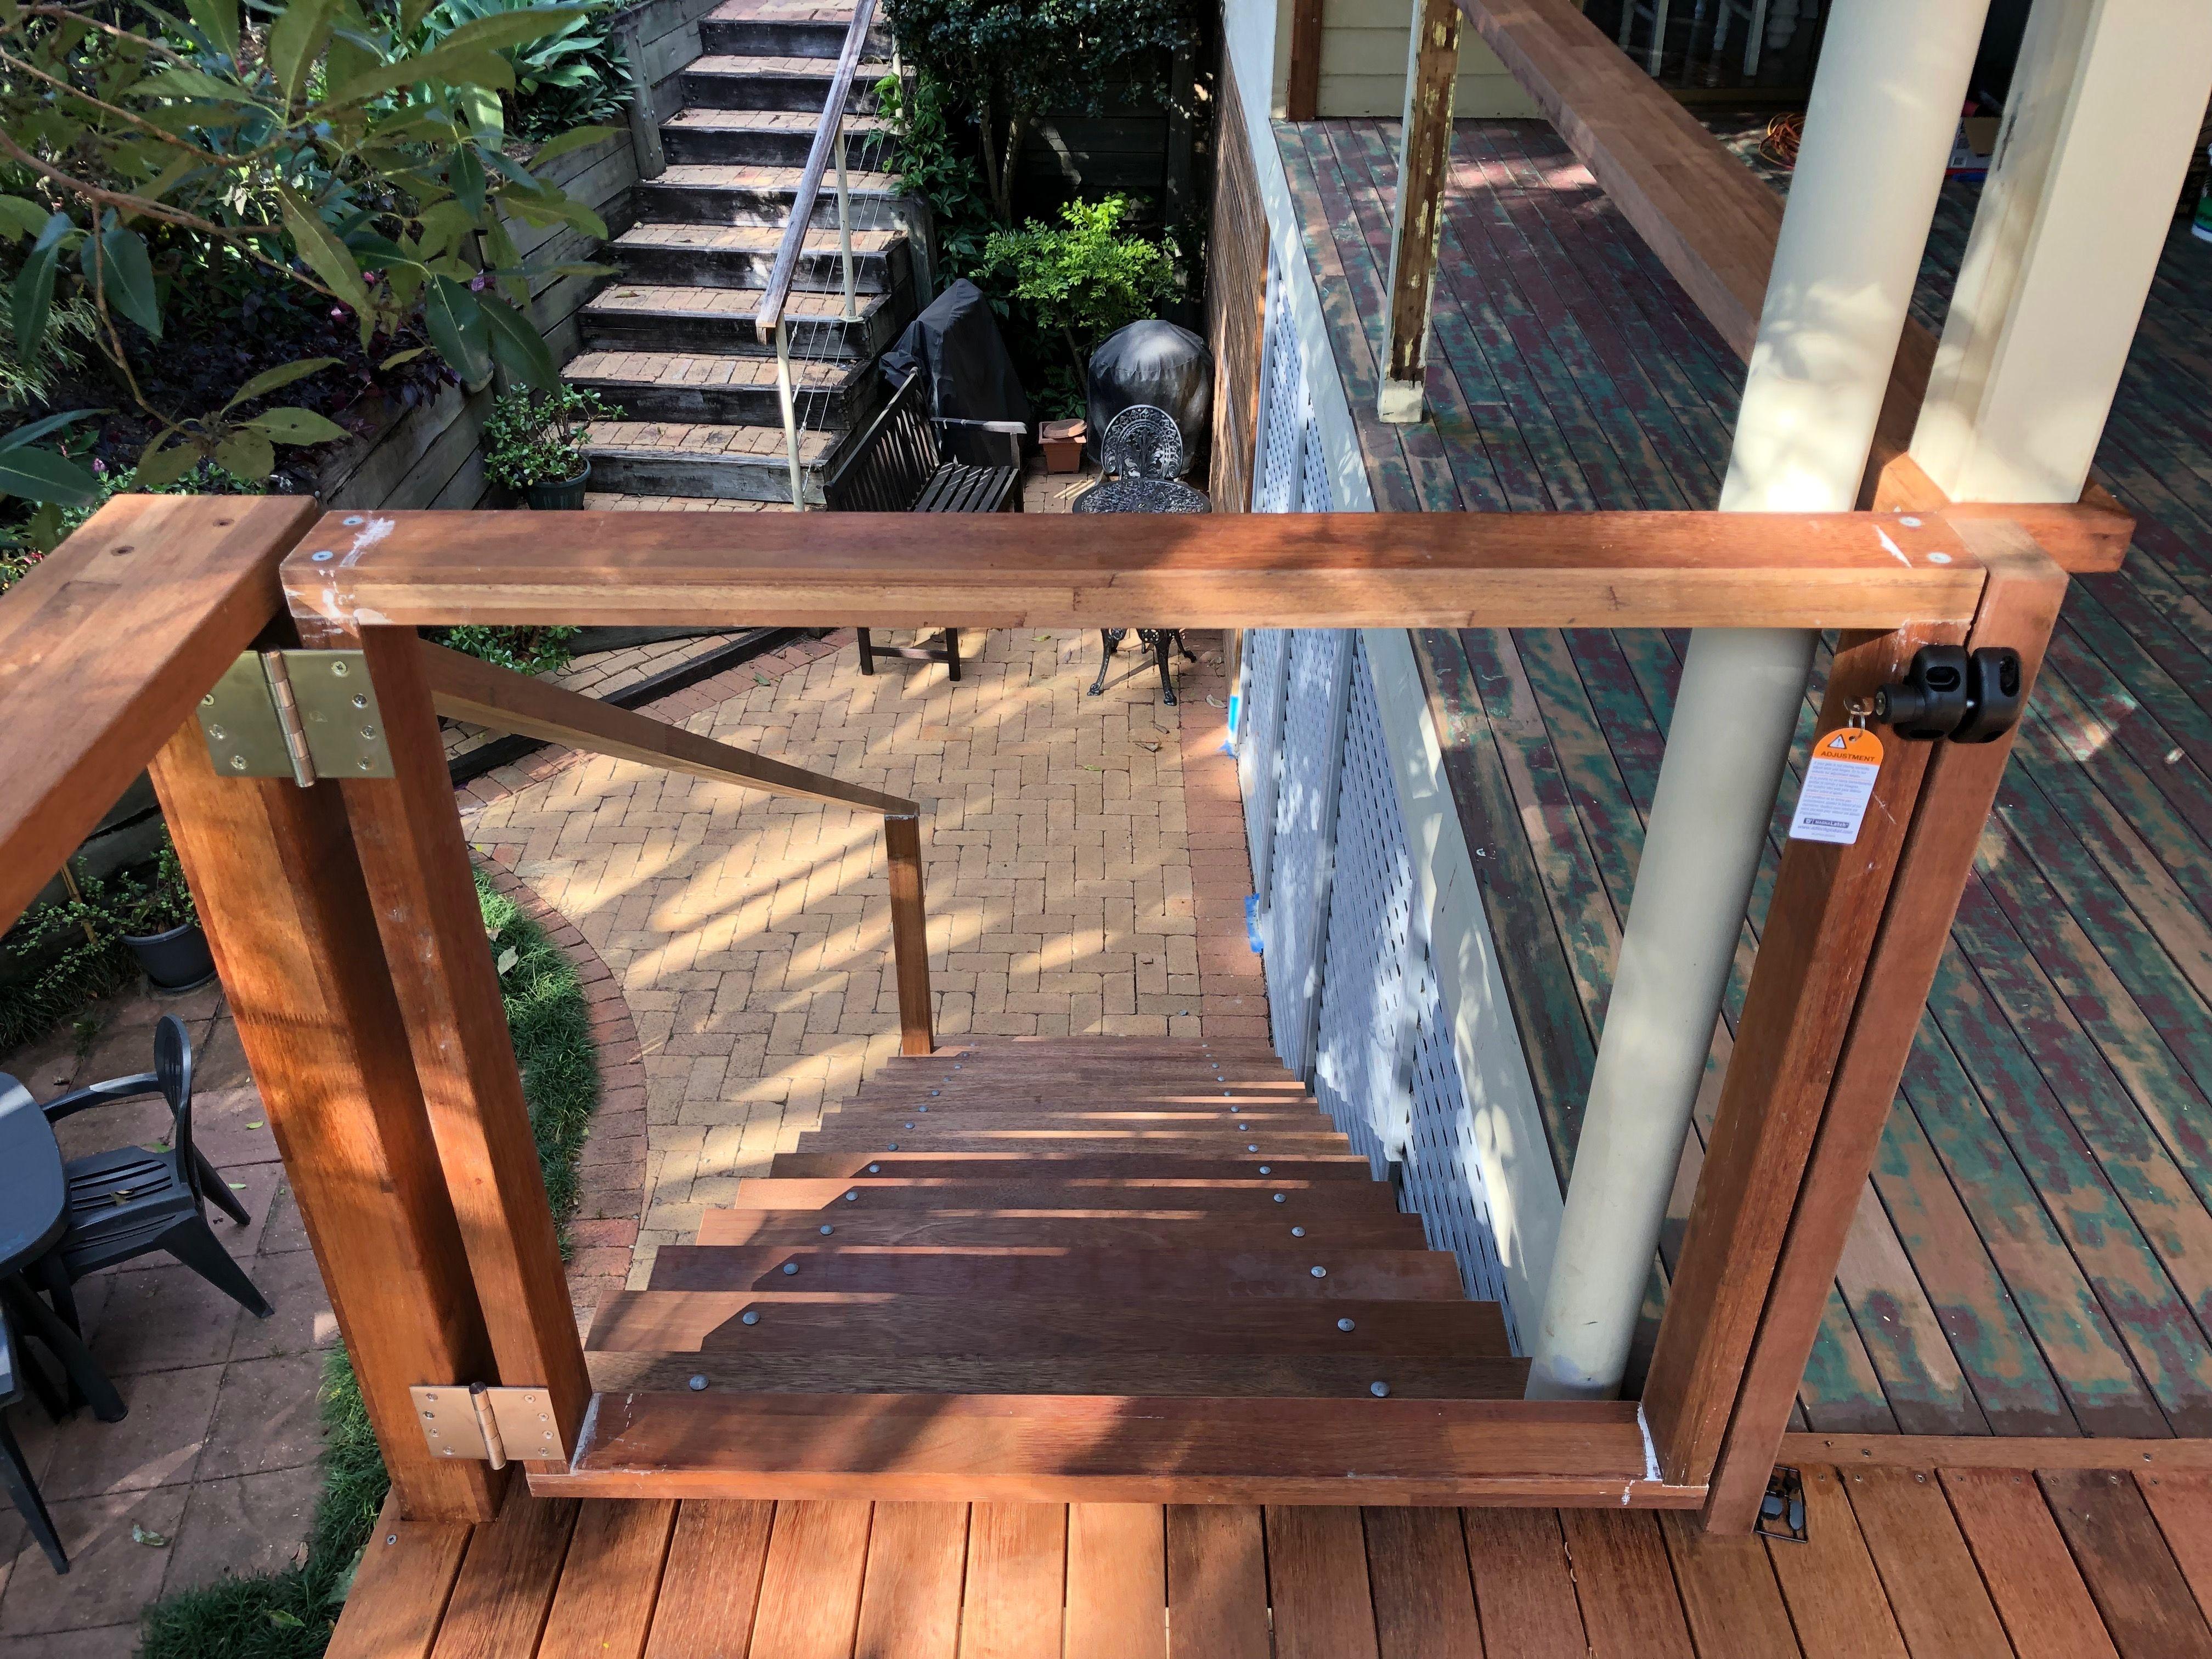 Pin by Karen Lal on Deck Deck